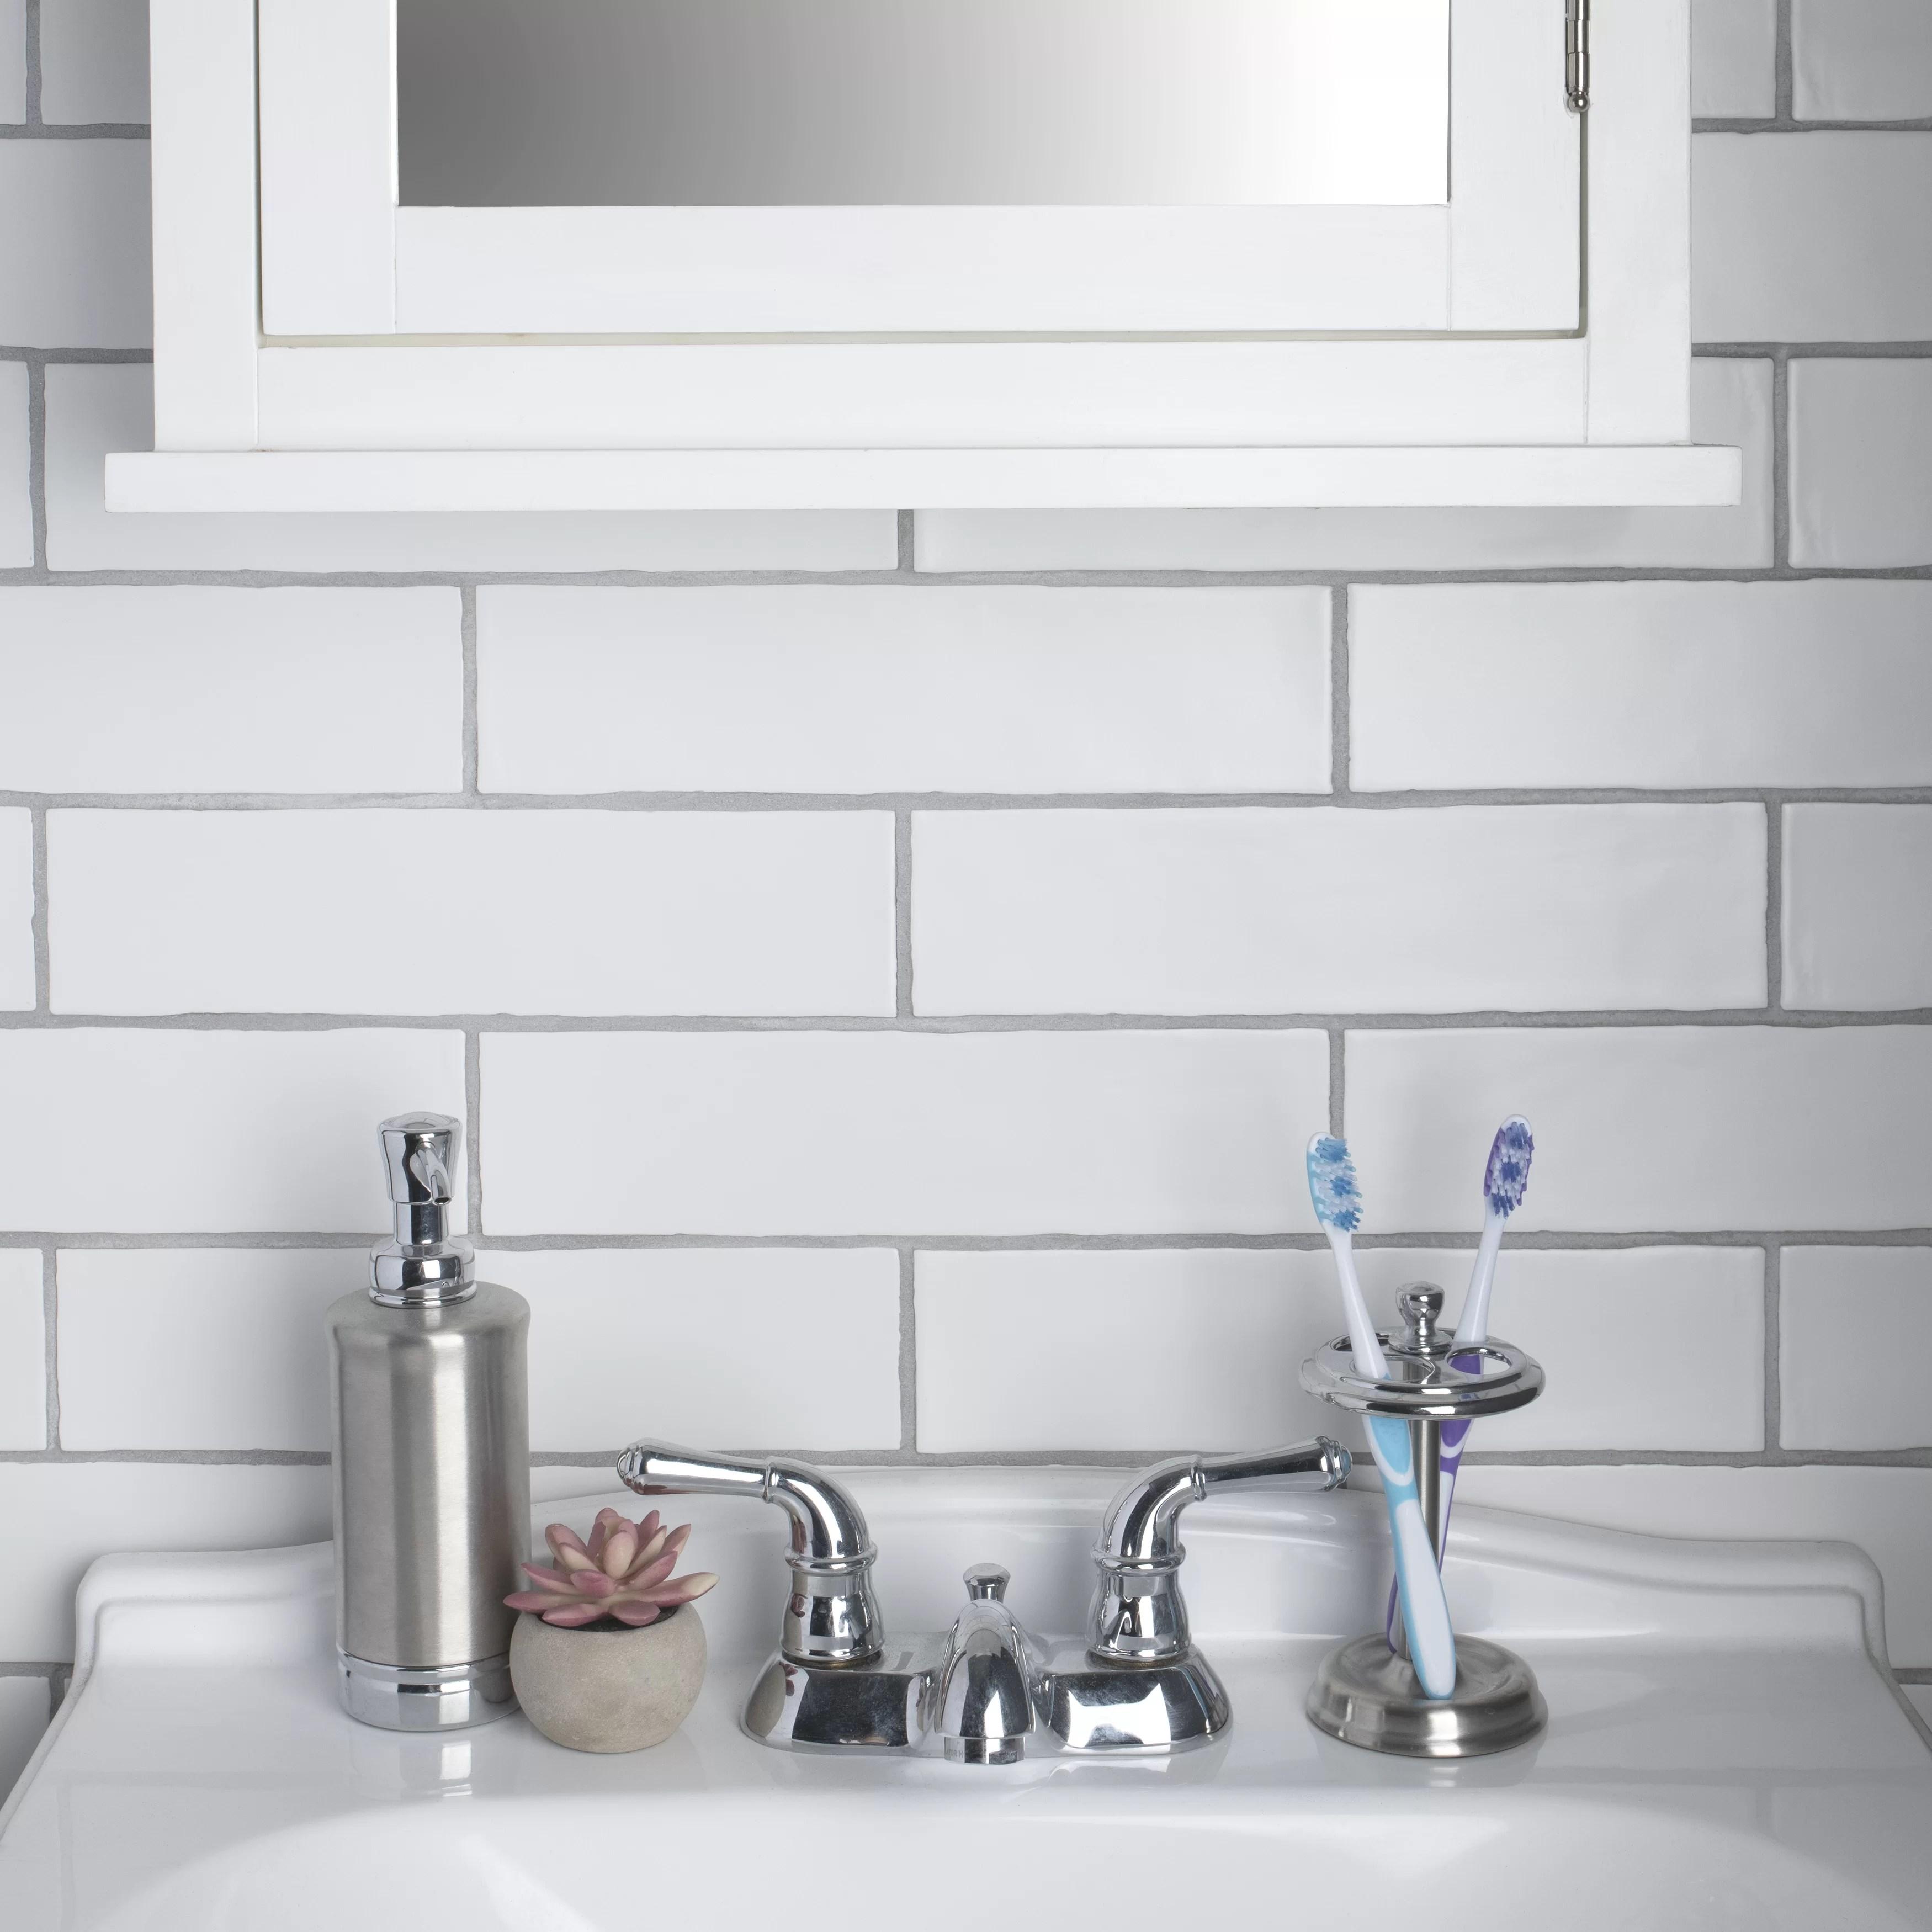 wall tile backsplash white 2x8 artisan